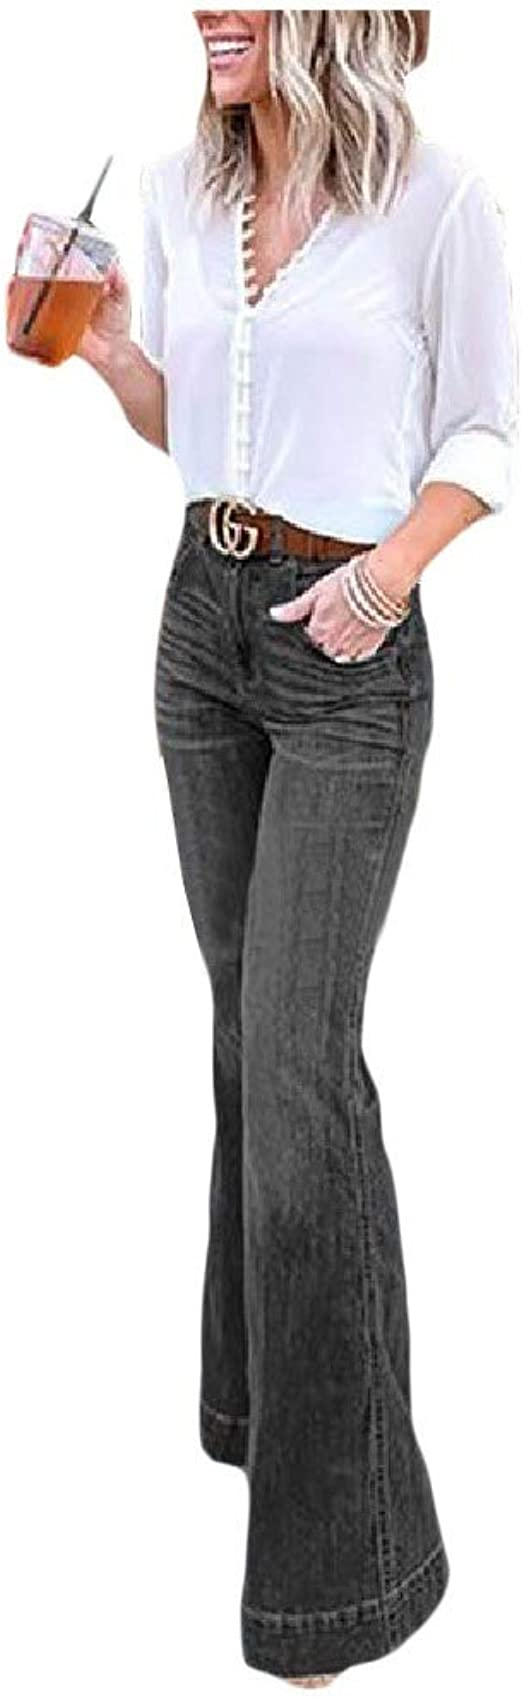 Nicellyer Womens High Waist Loose Bell Bottom Pants Casual Denim Jeans